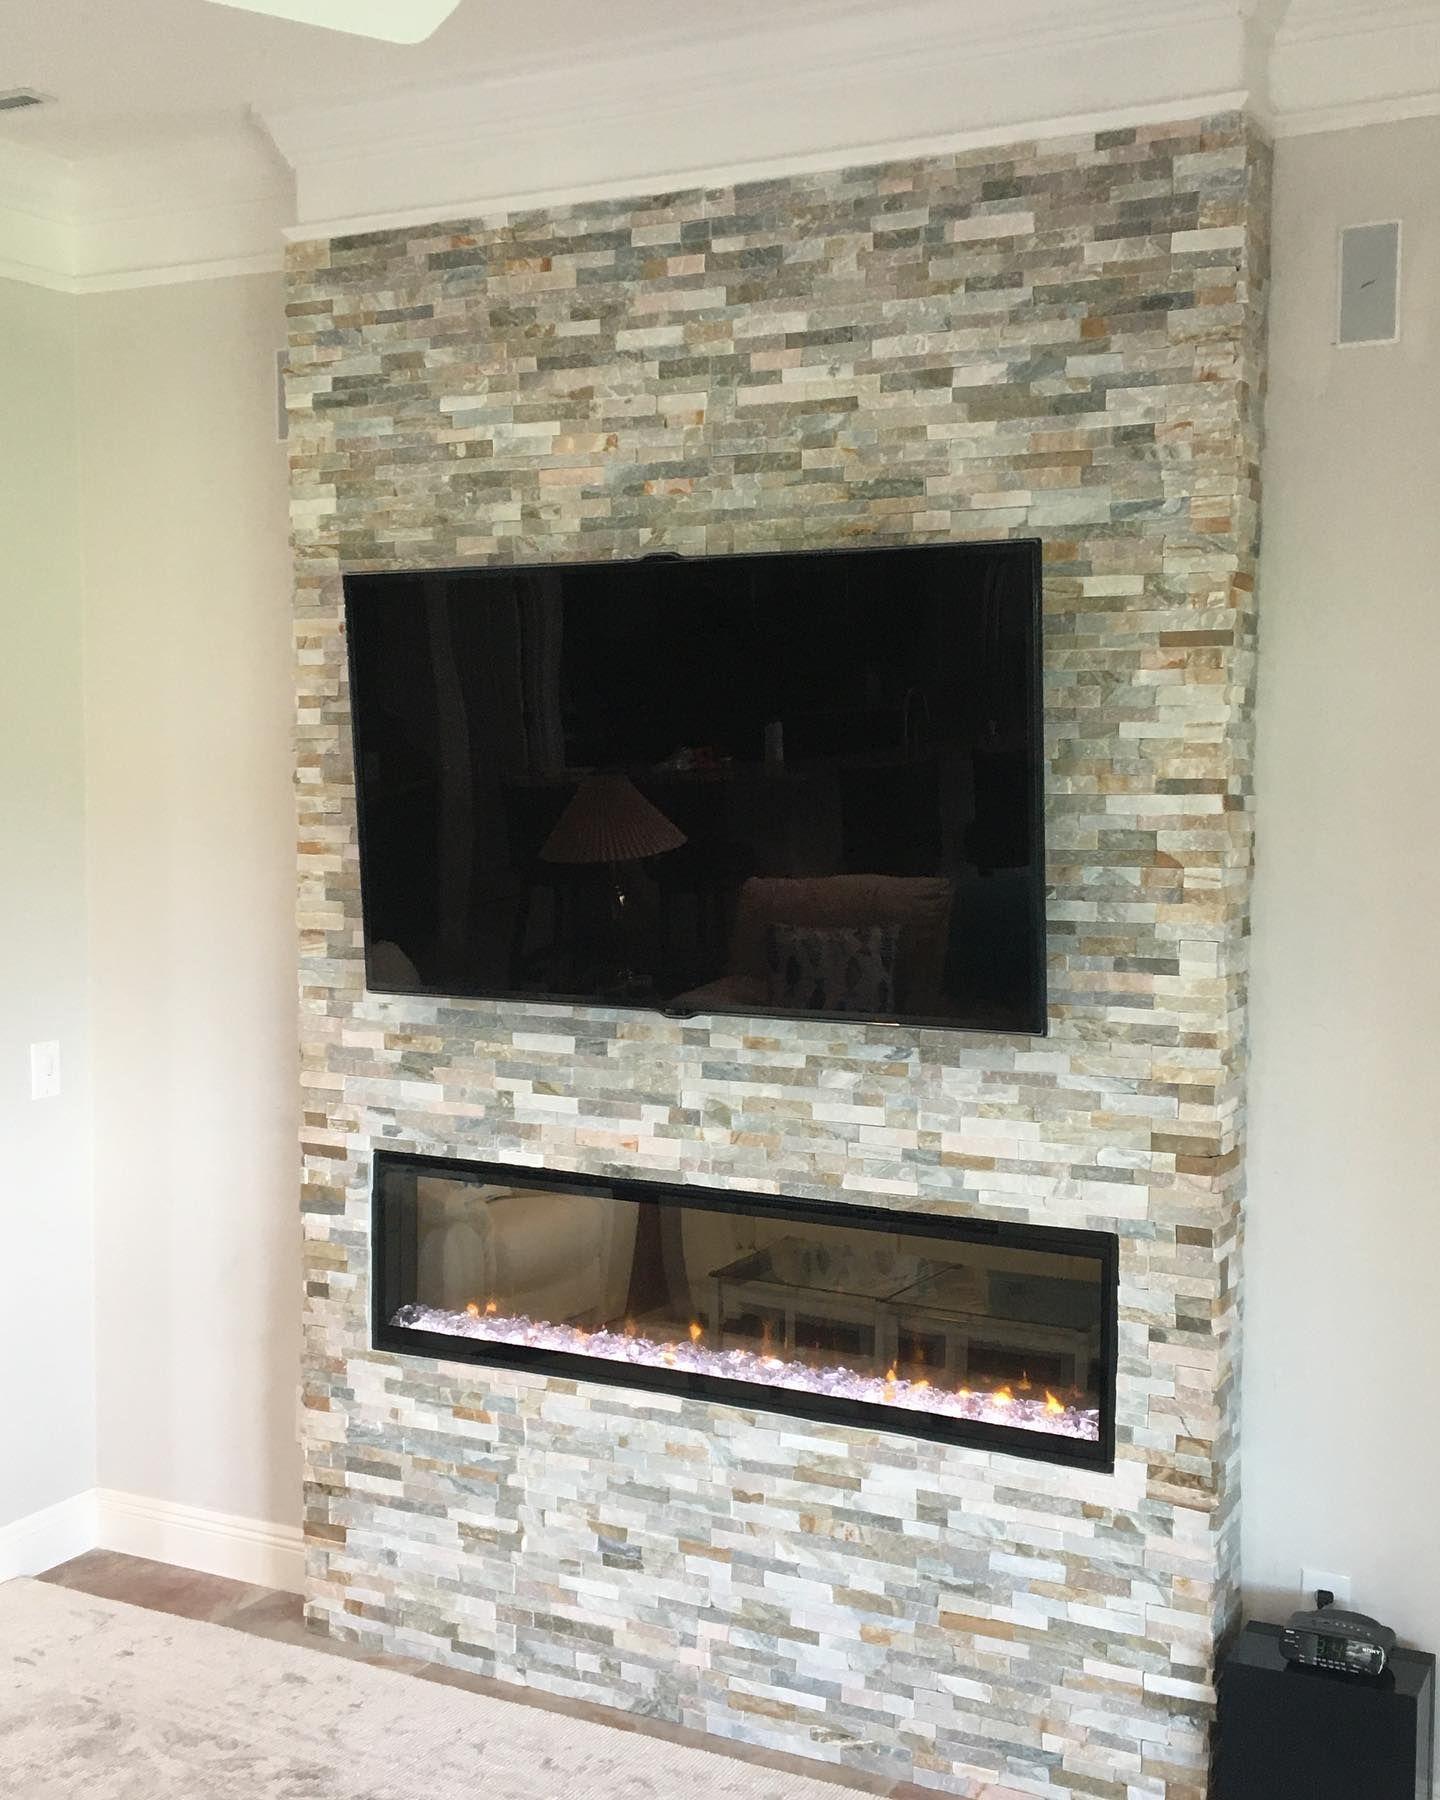 Dimplex Ignitexl 60 Linear Electric Fireplace Xlf60 Fireplace Electric Fireplace Dimplex